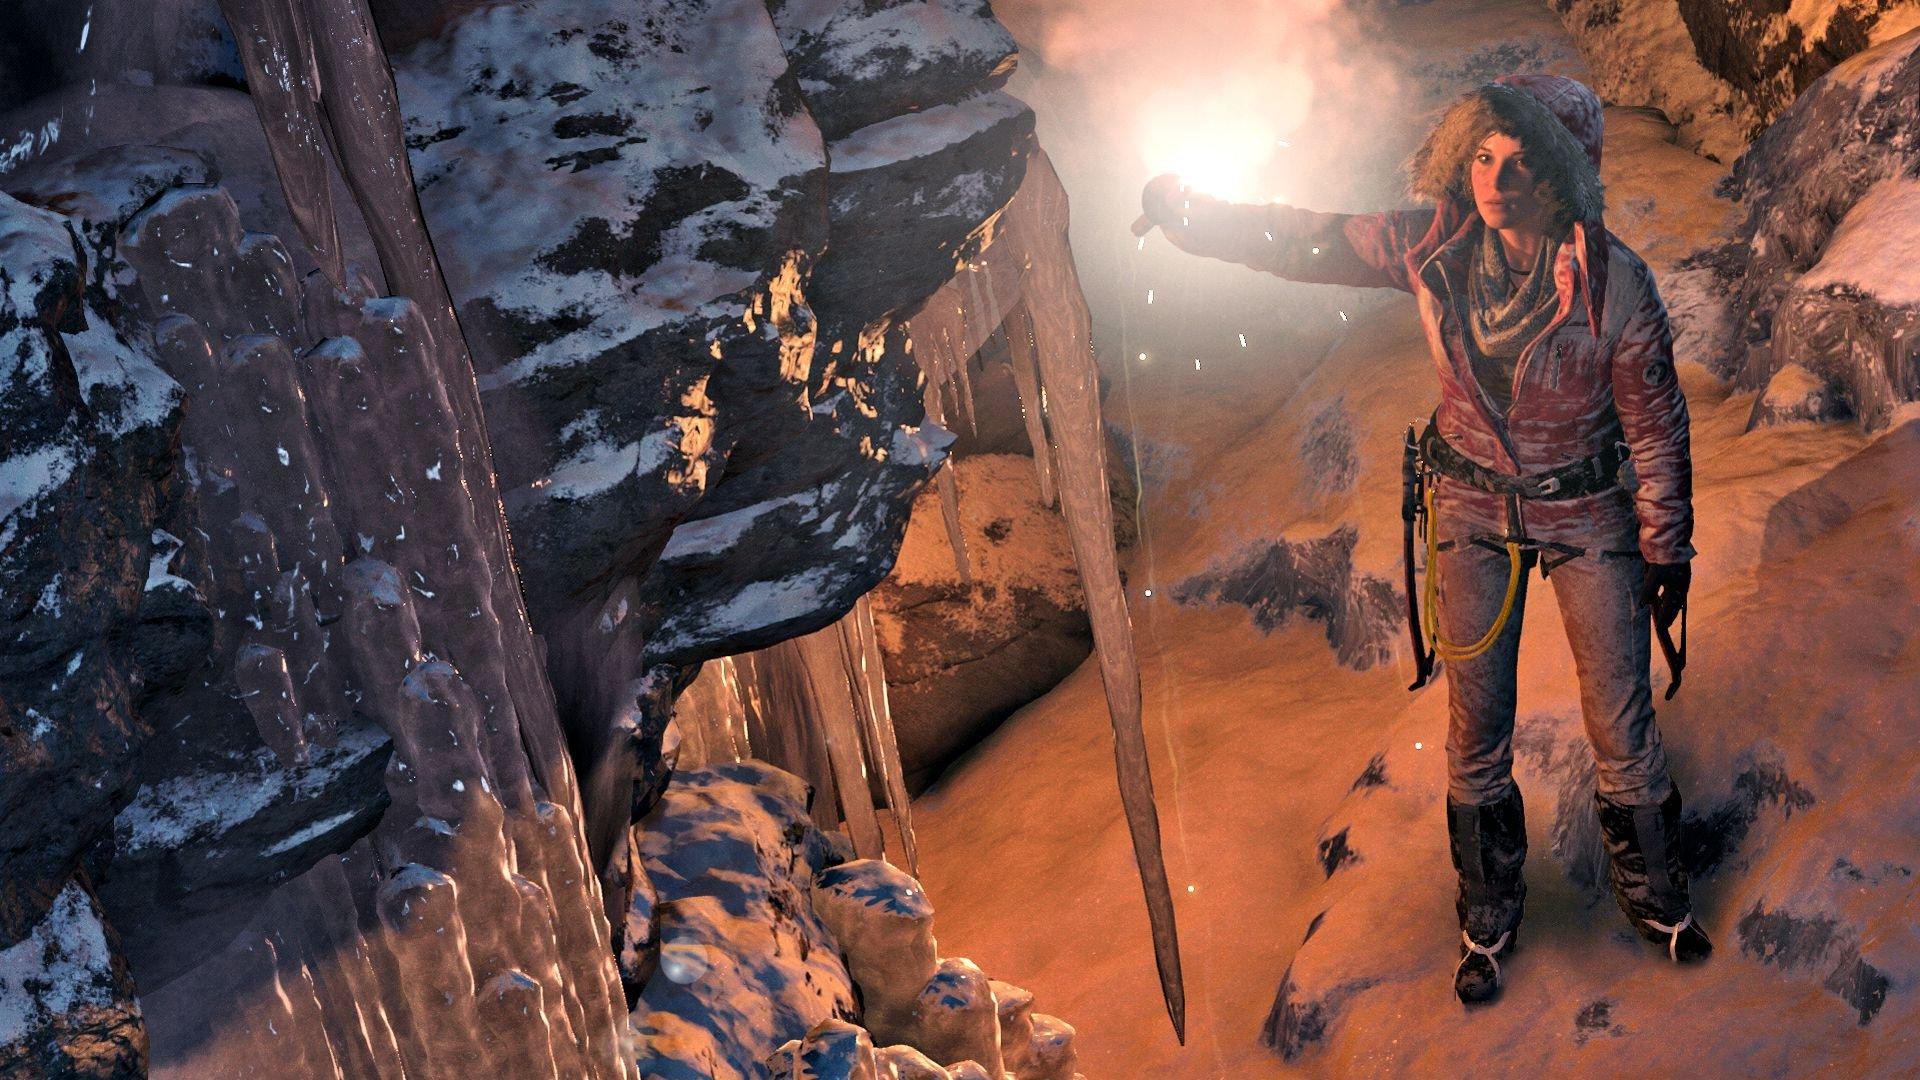 Tomb-Raider-Игры-Игровой-скриншот-Rise-of-the-Tomb-Raider-1887432